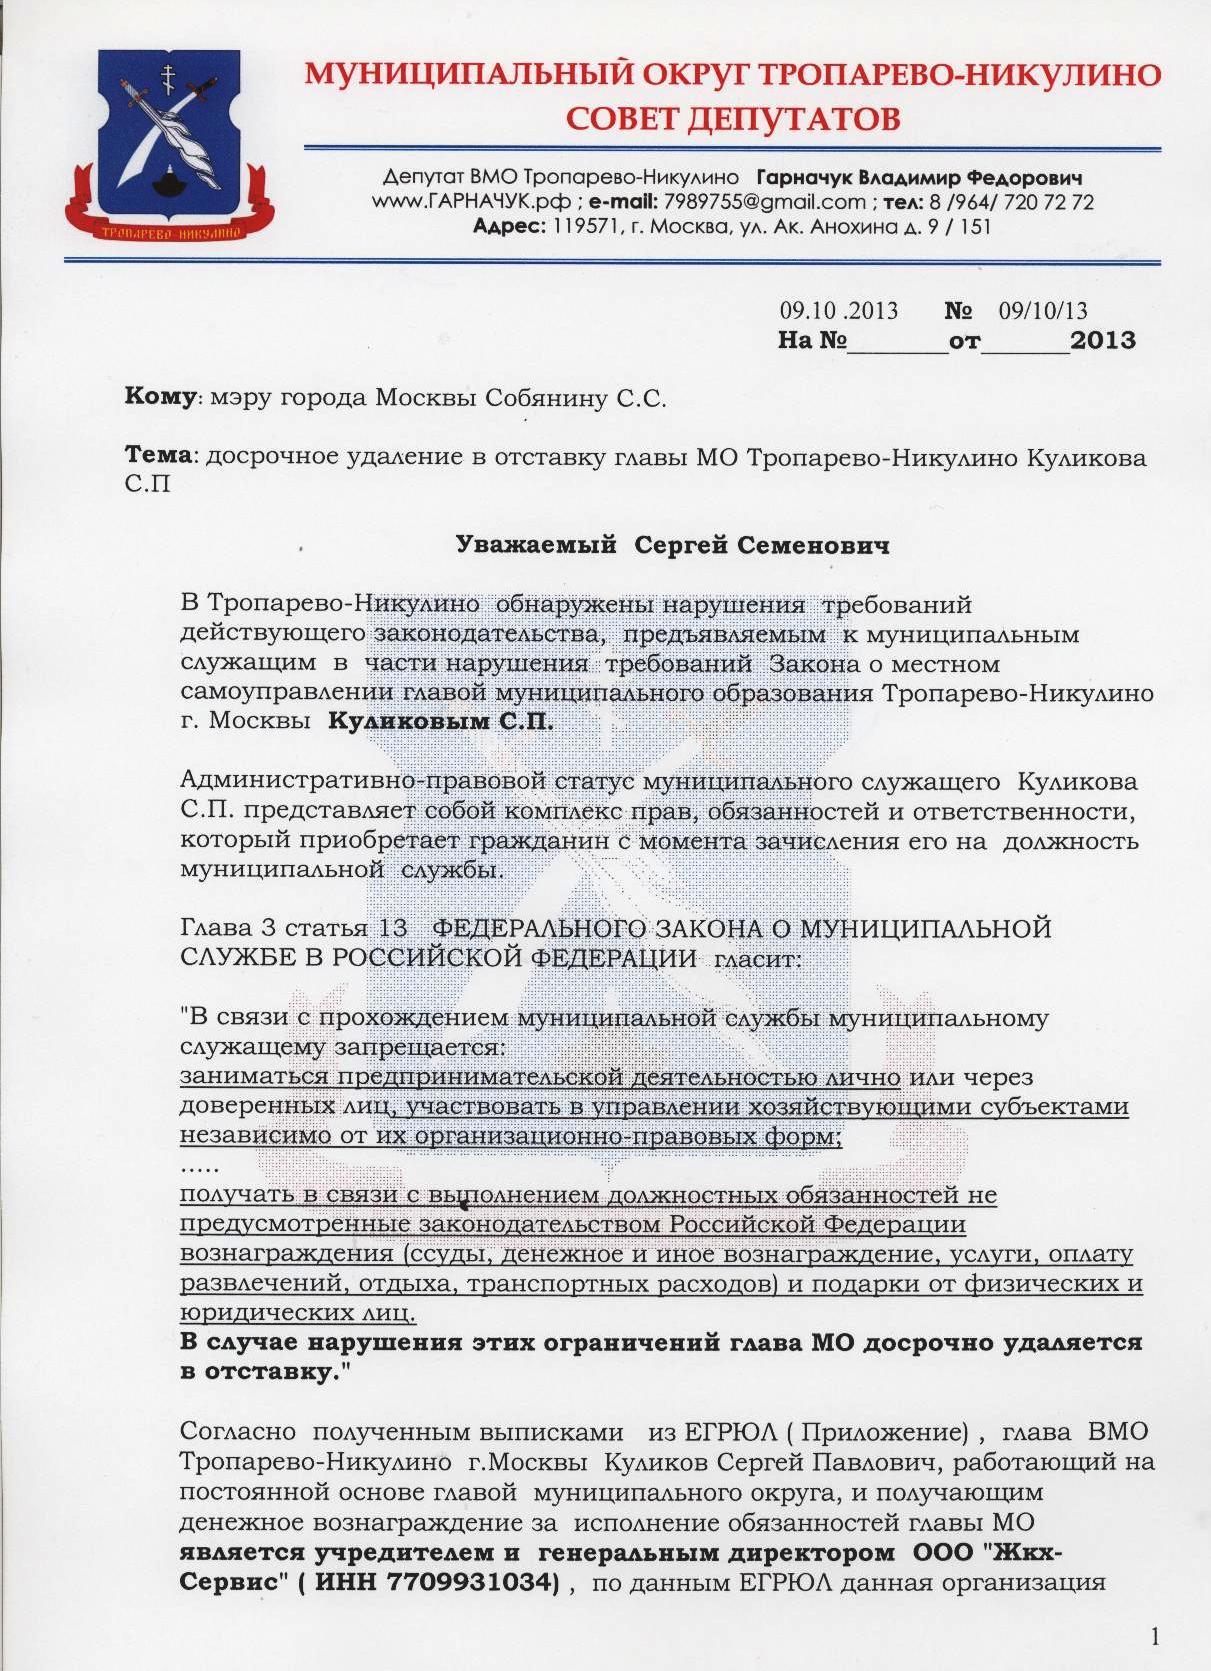 обращене собянин  по куликову 9 .10.13